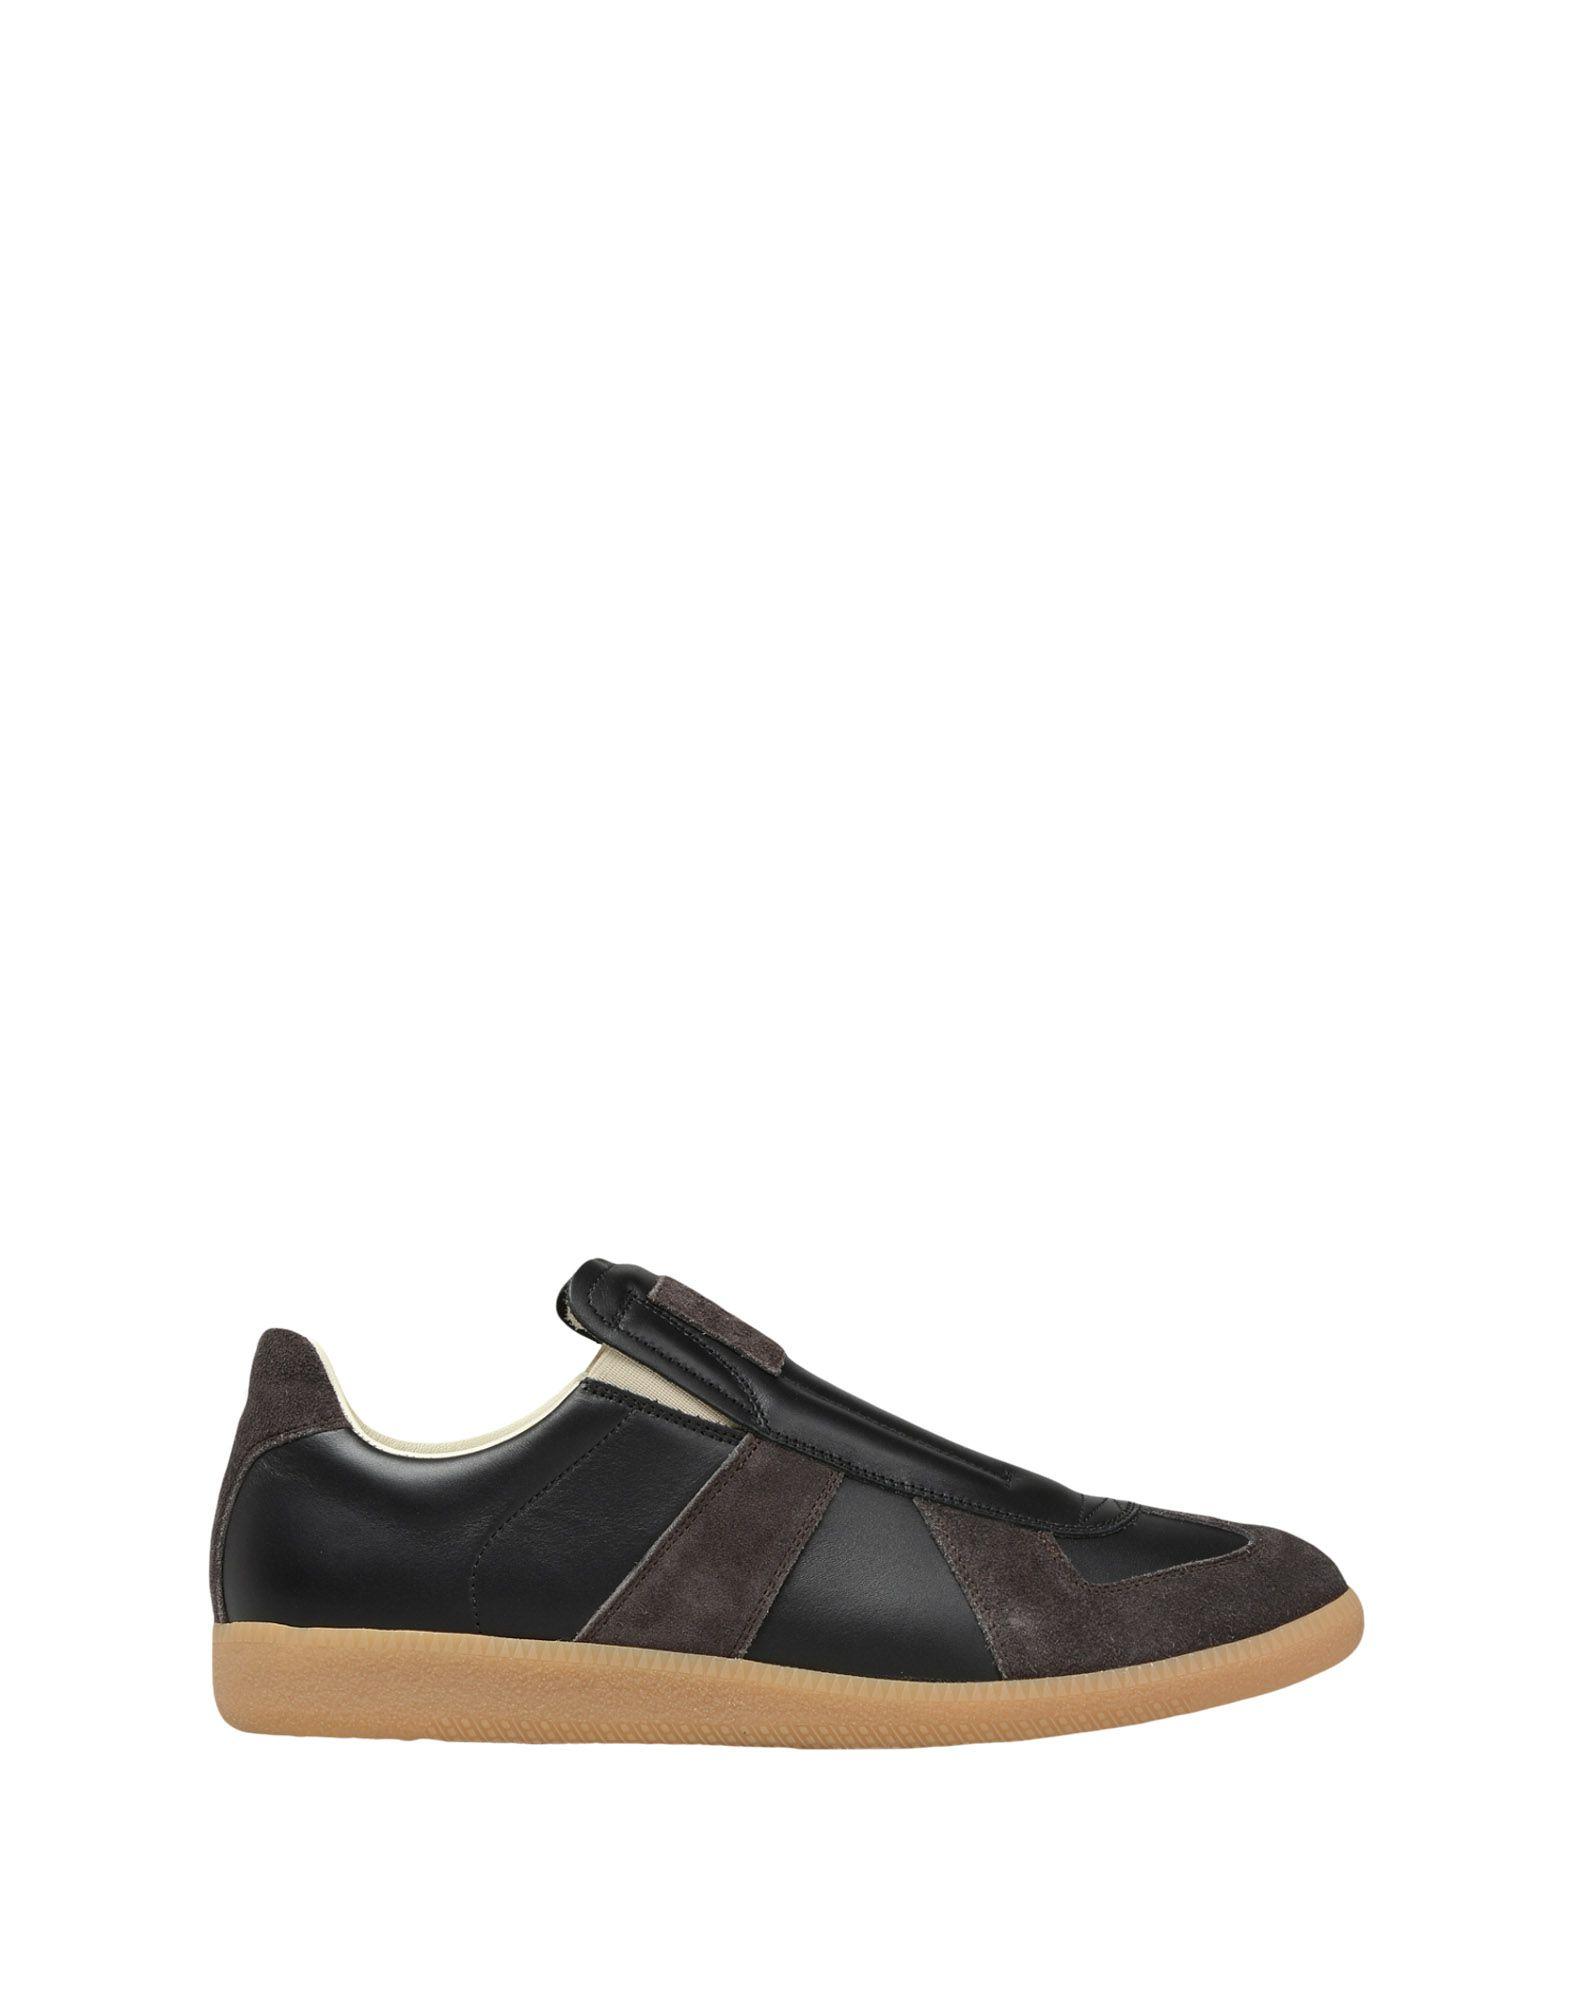 Maison Margiela Sneakers Herren   Herren 11343468XE Gute Qualität beliebte Schuhe b6908a